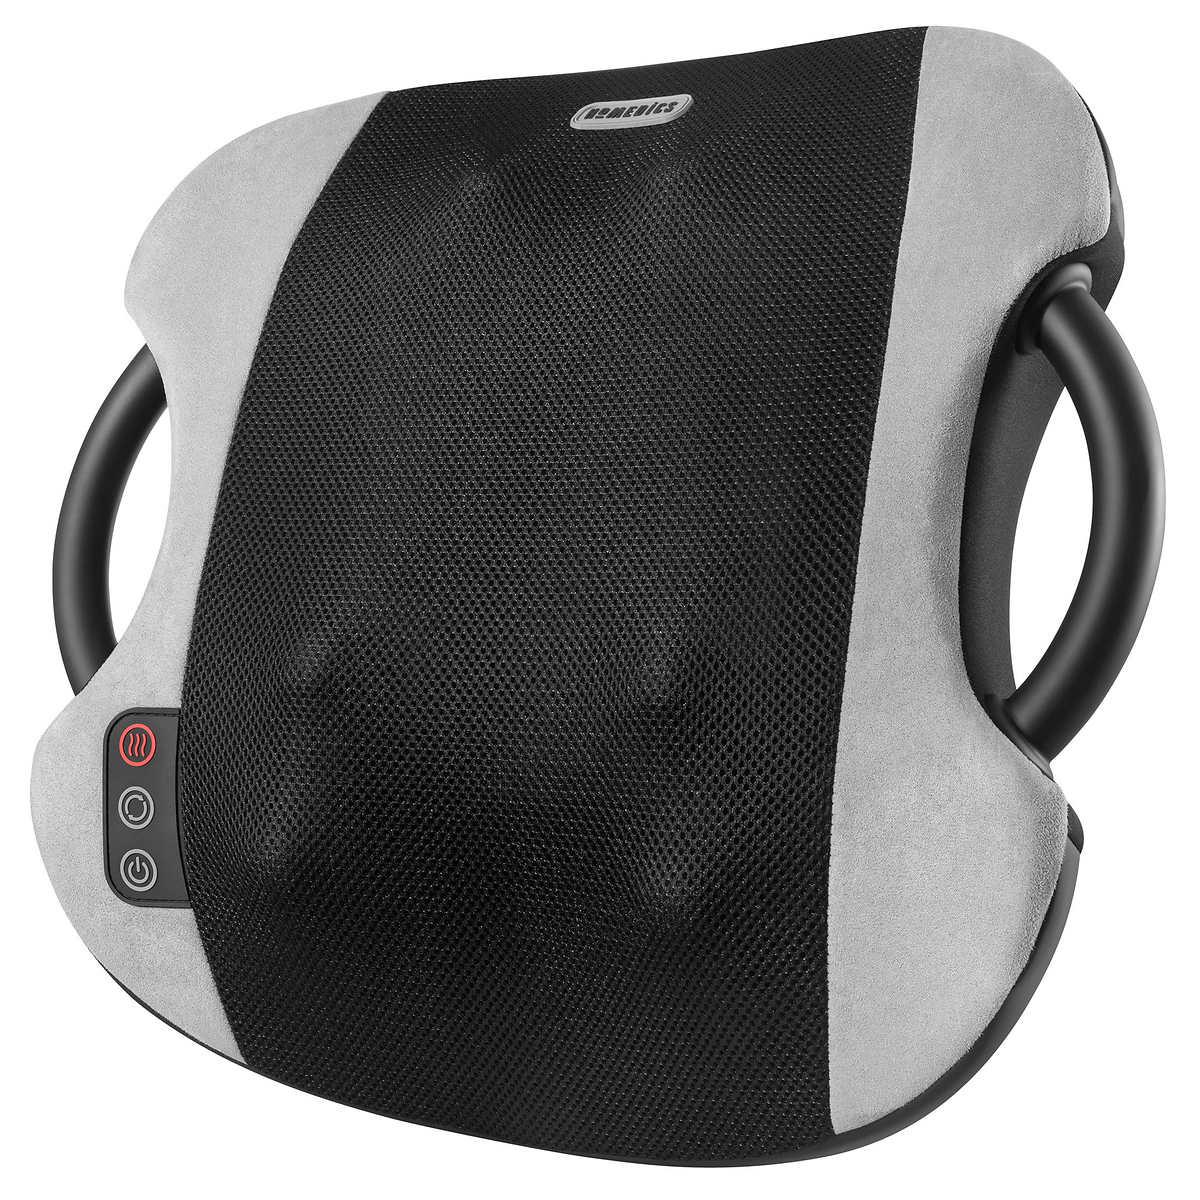 Homedics shiatsu premier back massager with heat